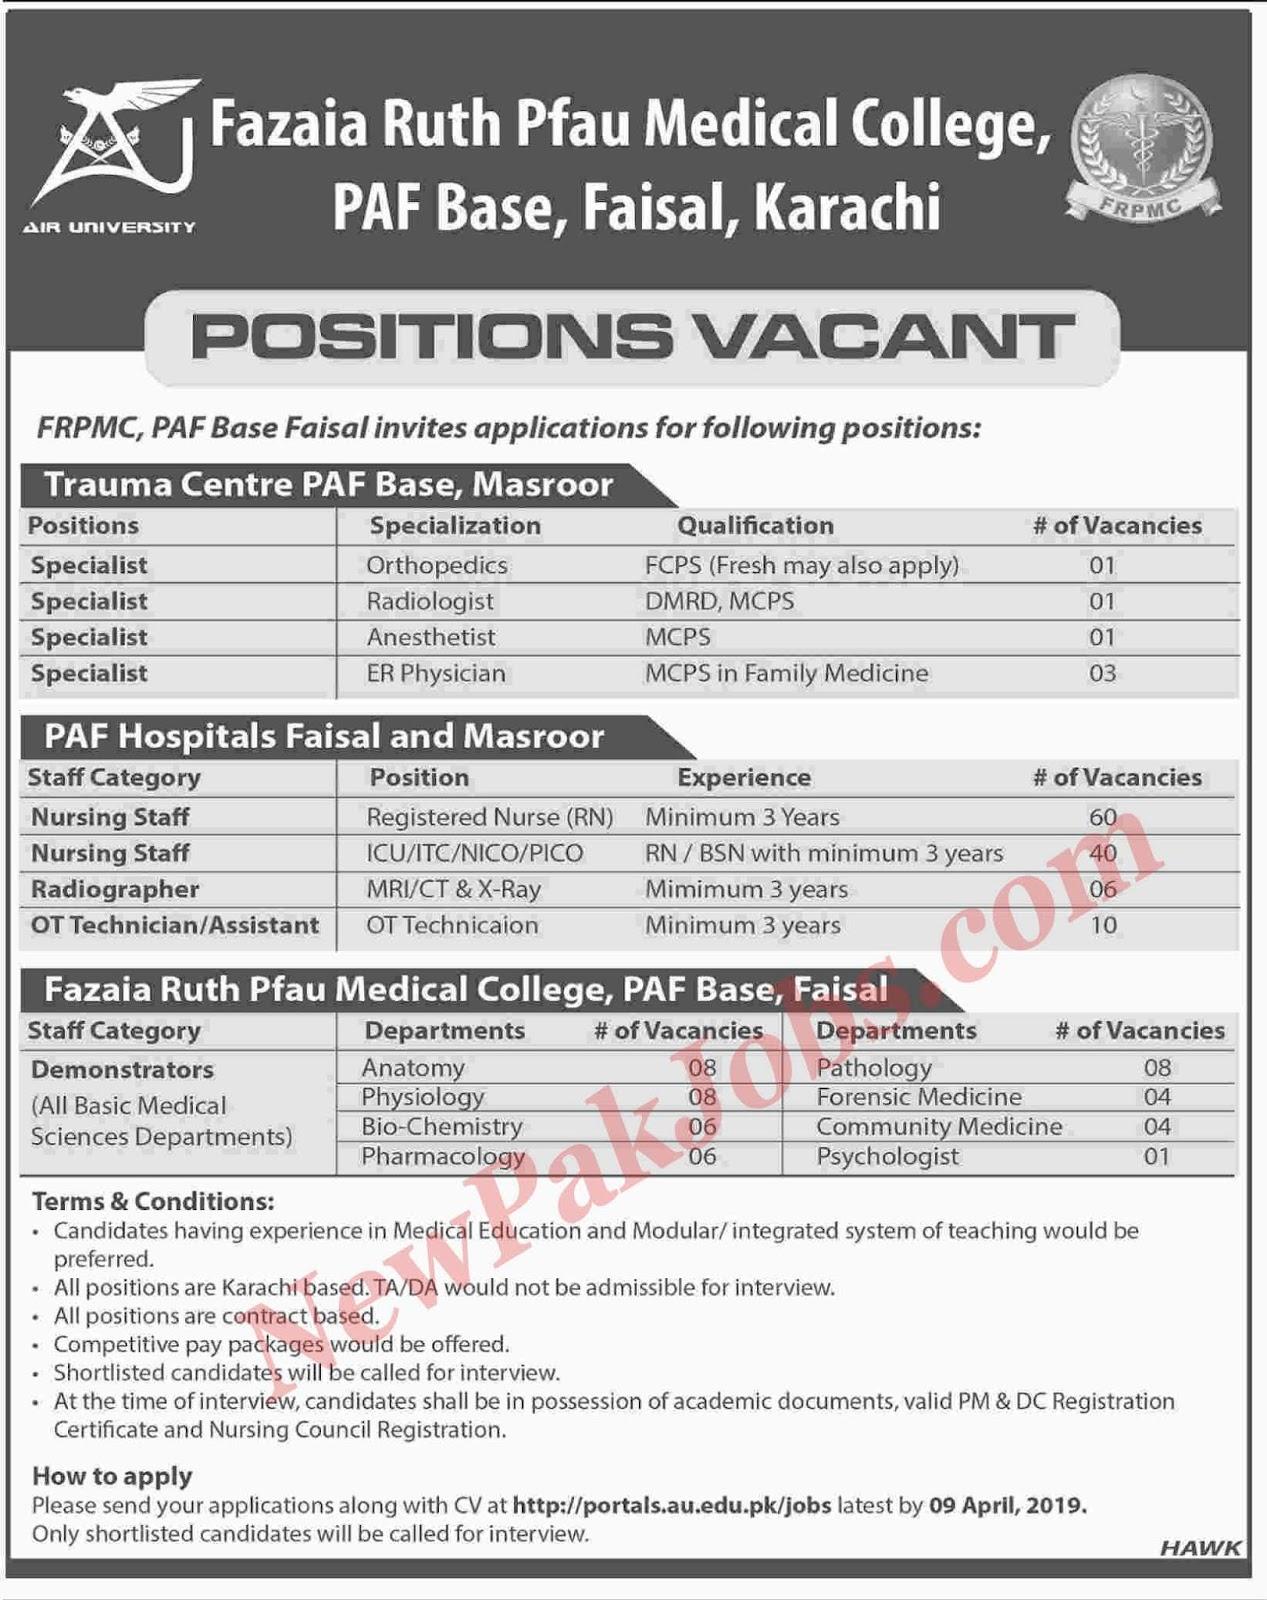 Fazaia Rugh PFau Medical Colelge PAF Base Jobs 2019 (139 Vacancies)